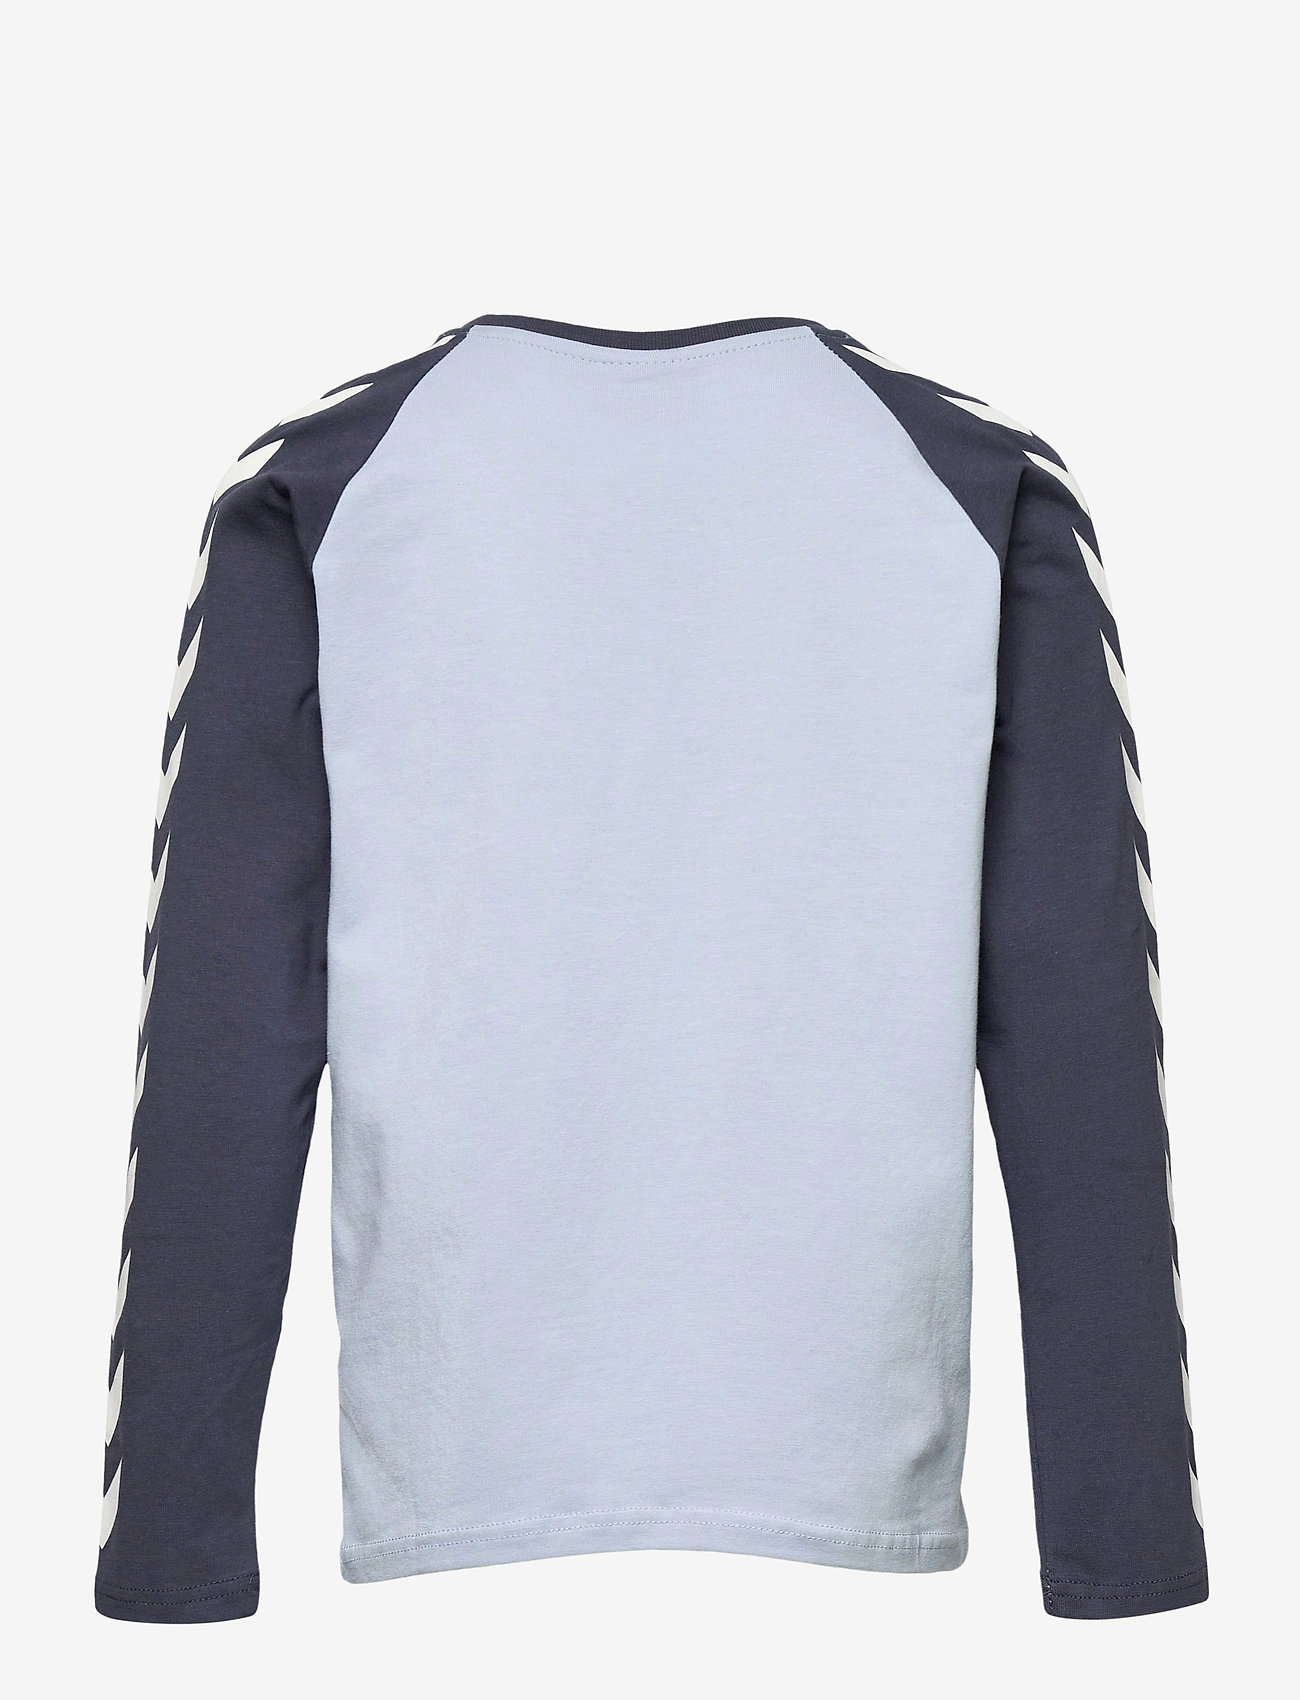 Hummel - hmlBOYS T-SHIRT L/S - long-sleeved t-shirts - blue fog - 1